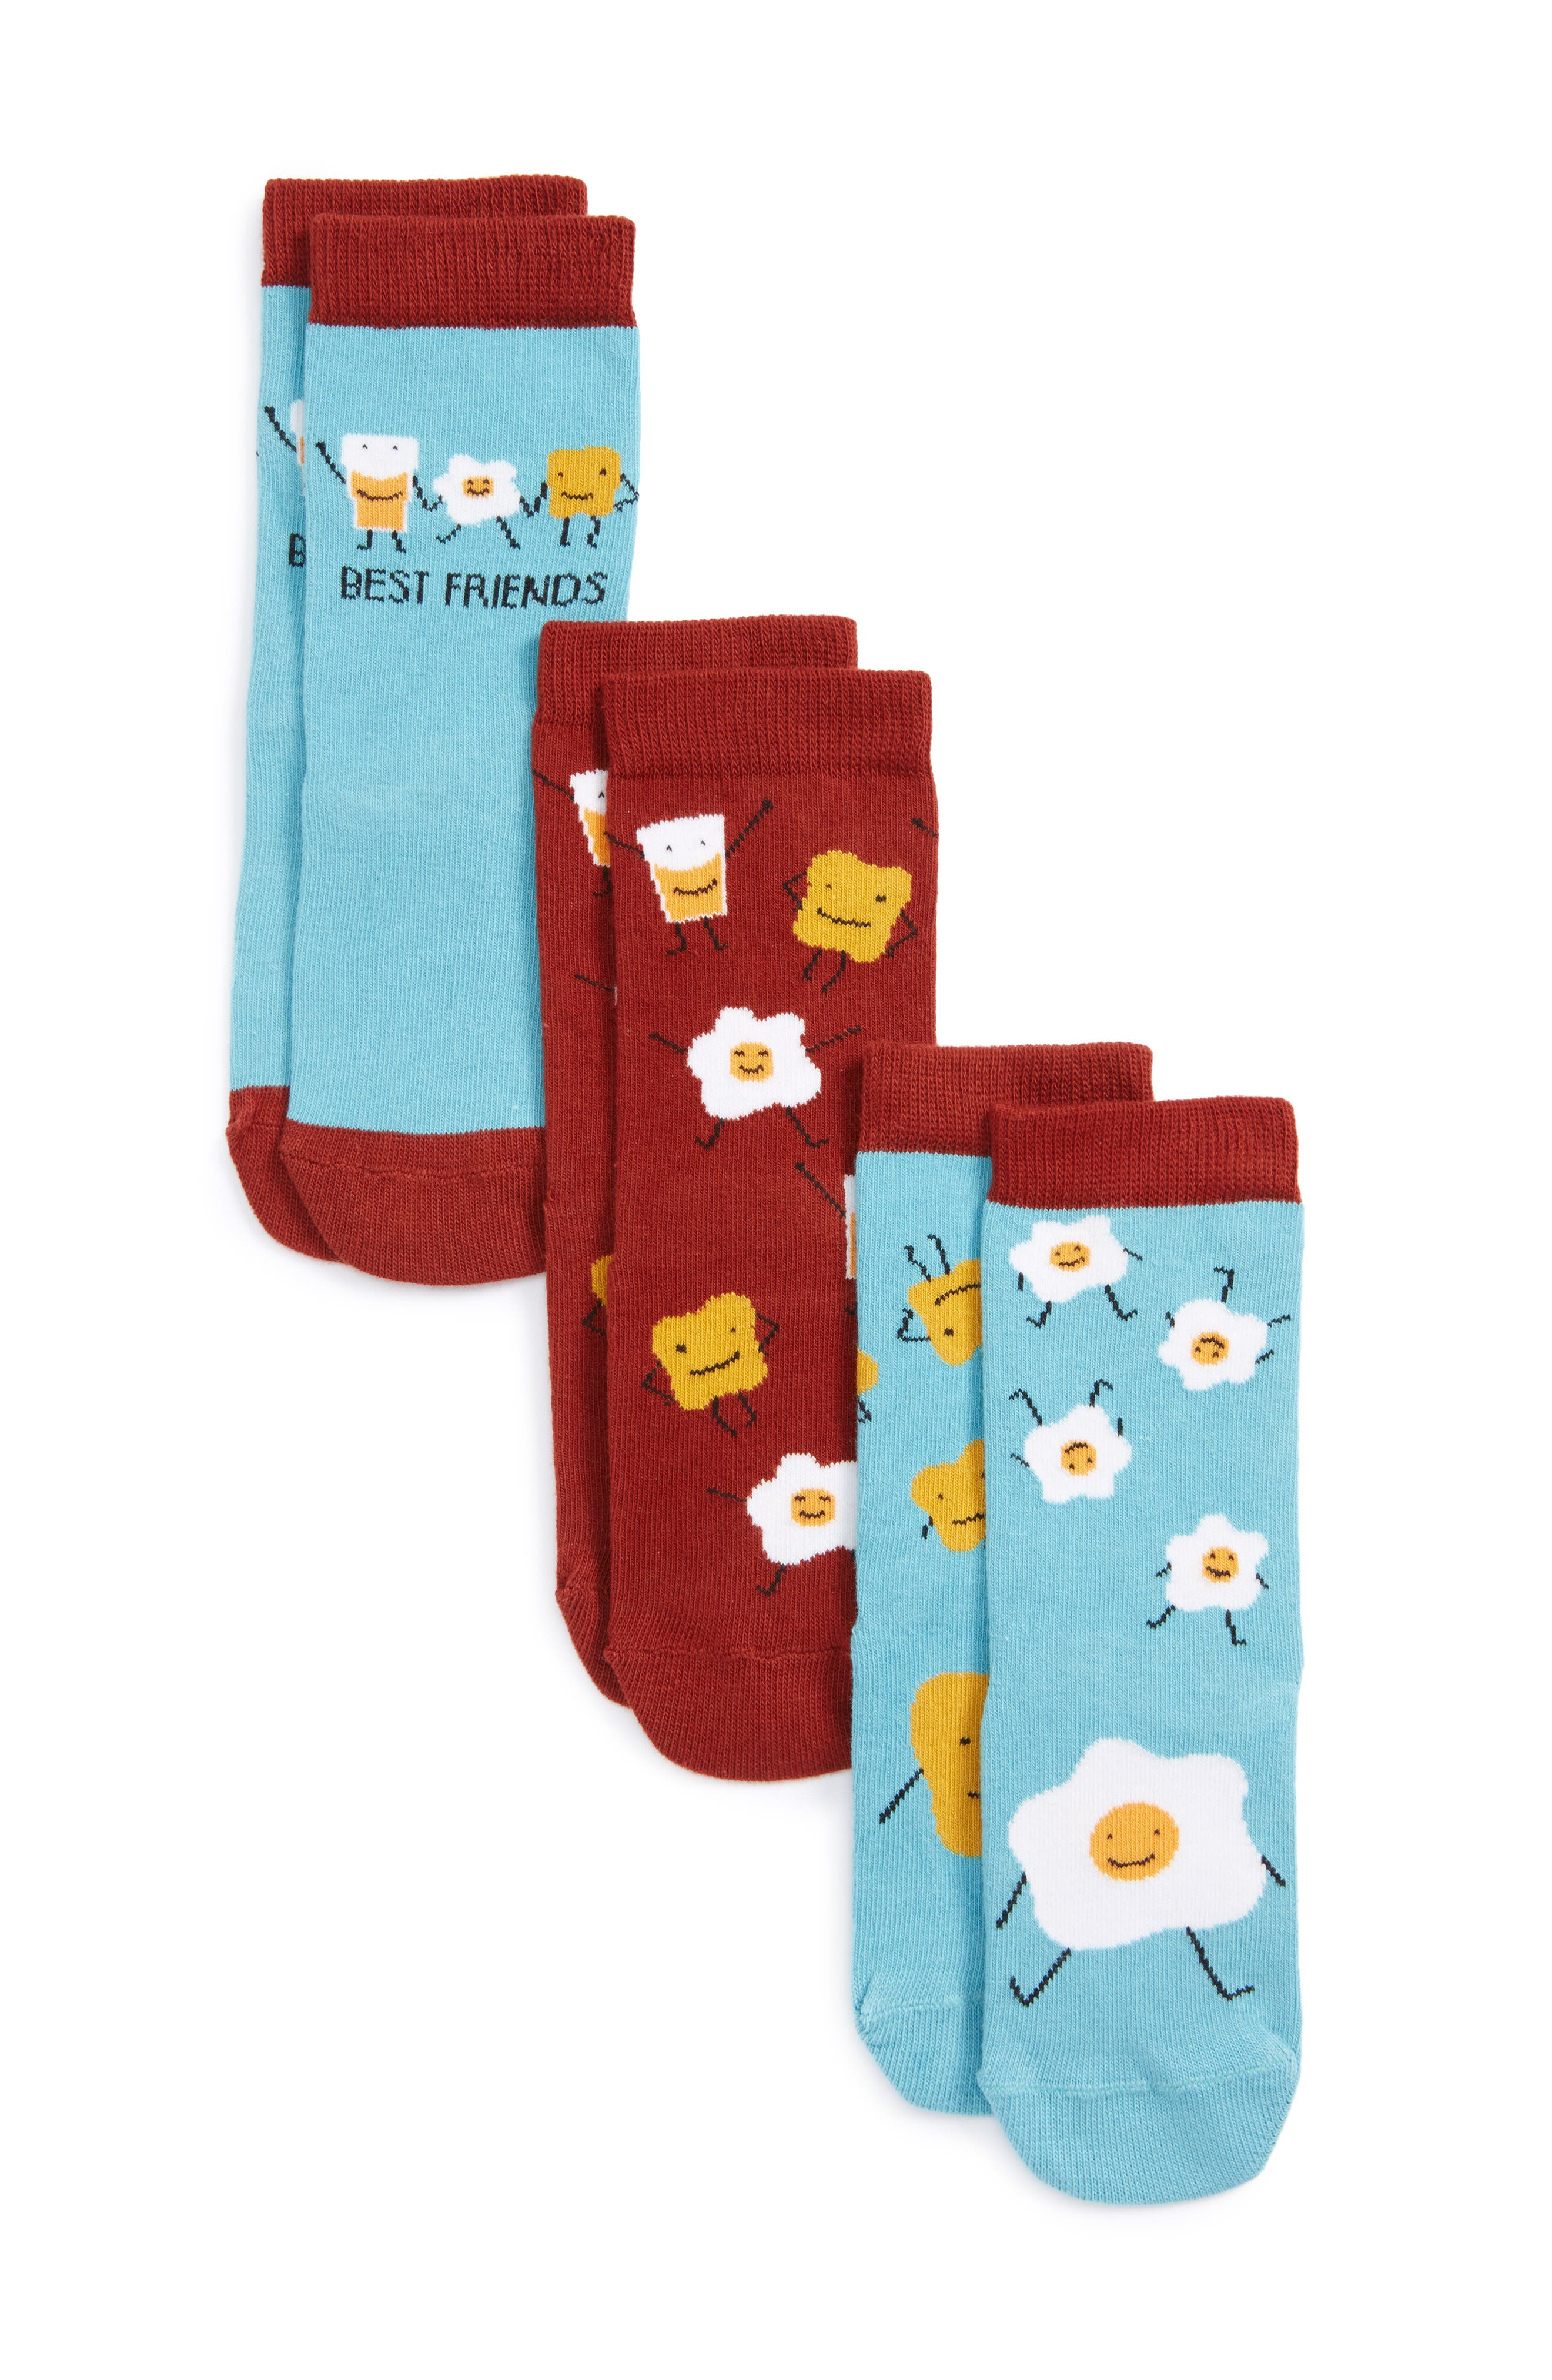 TUCKER + TATE Sunny Side Up Assorted 3-Pack Crew Socks